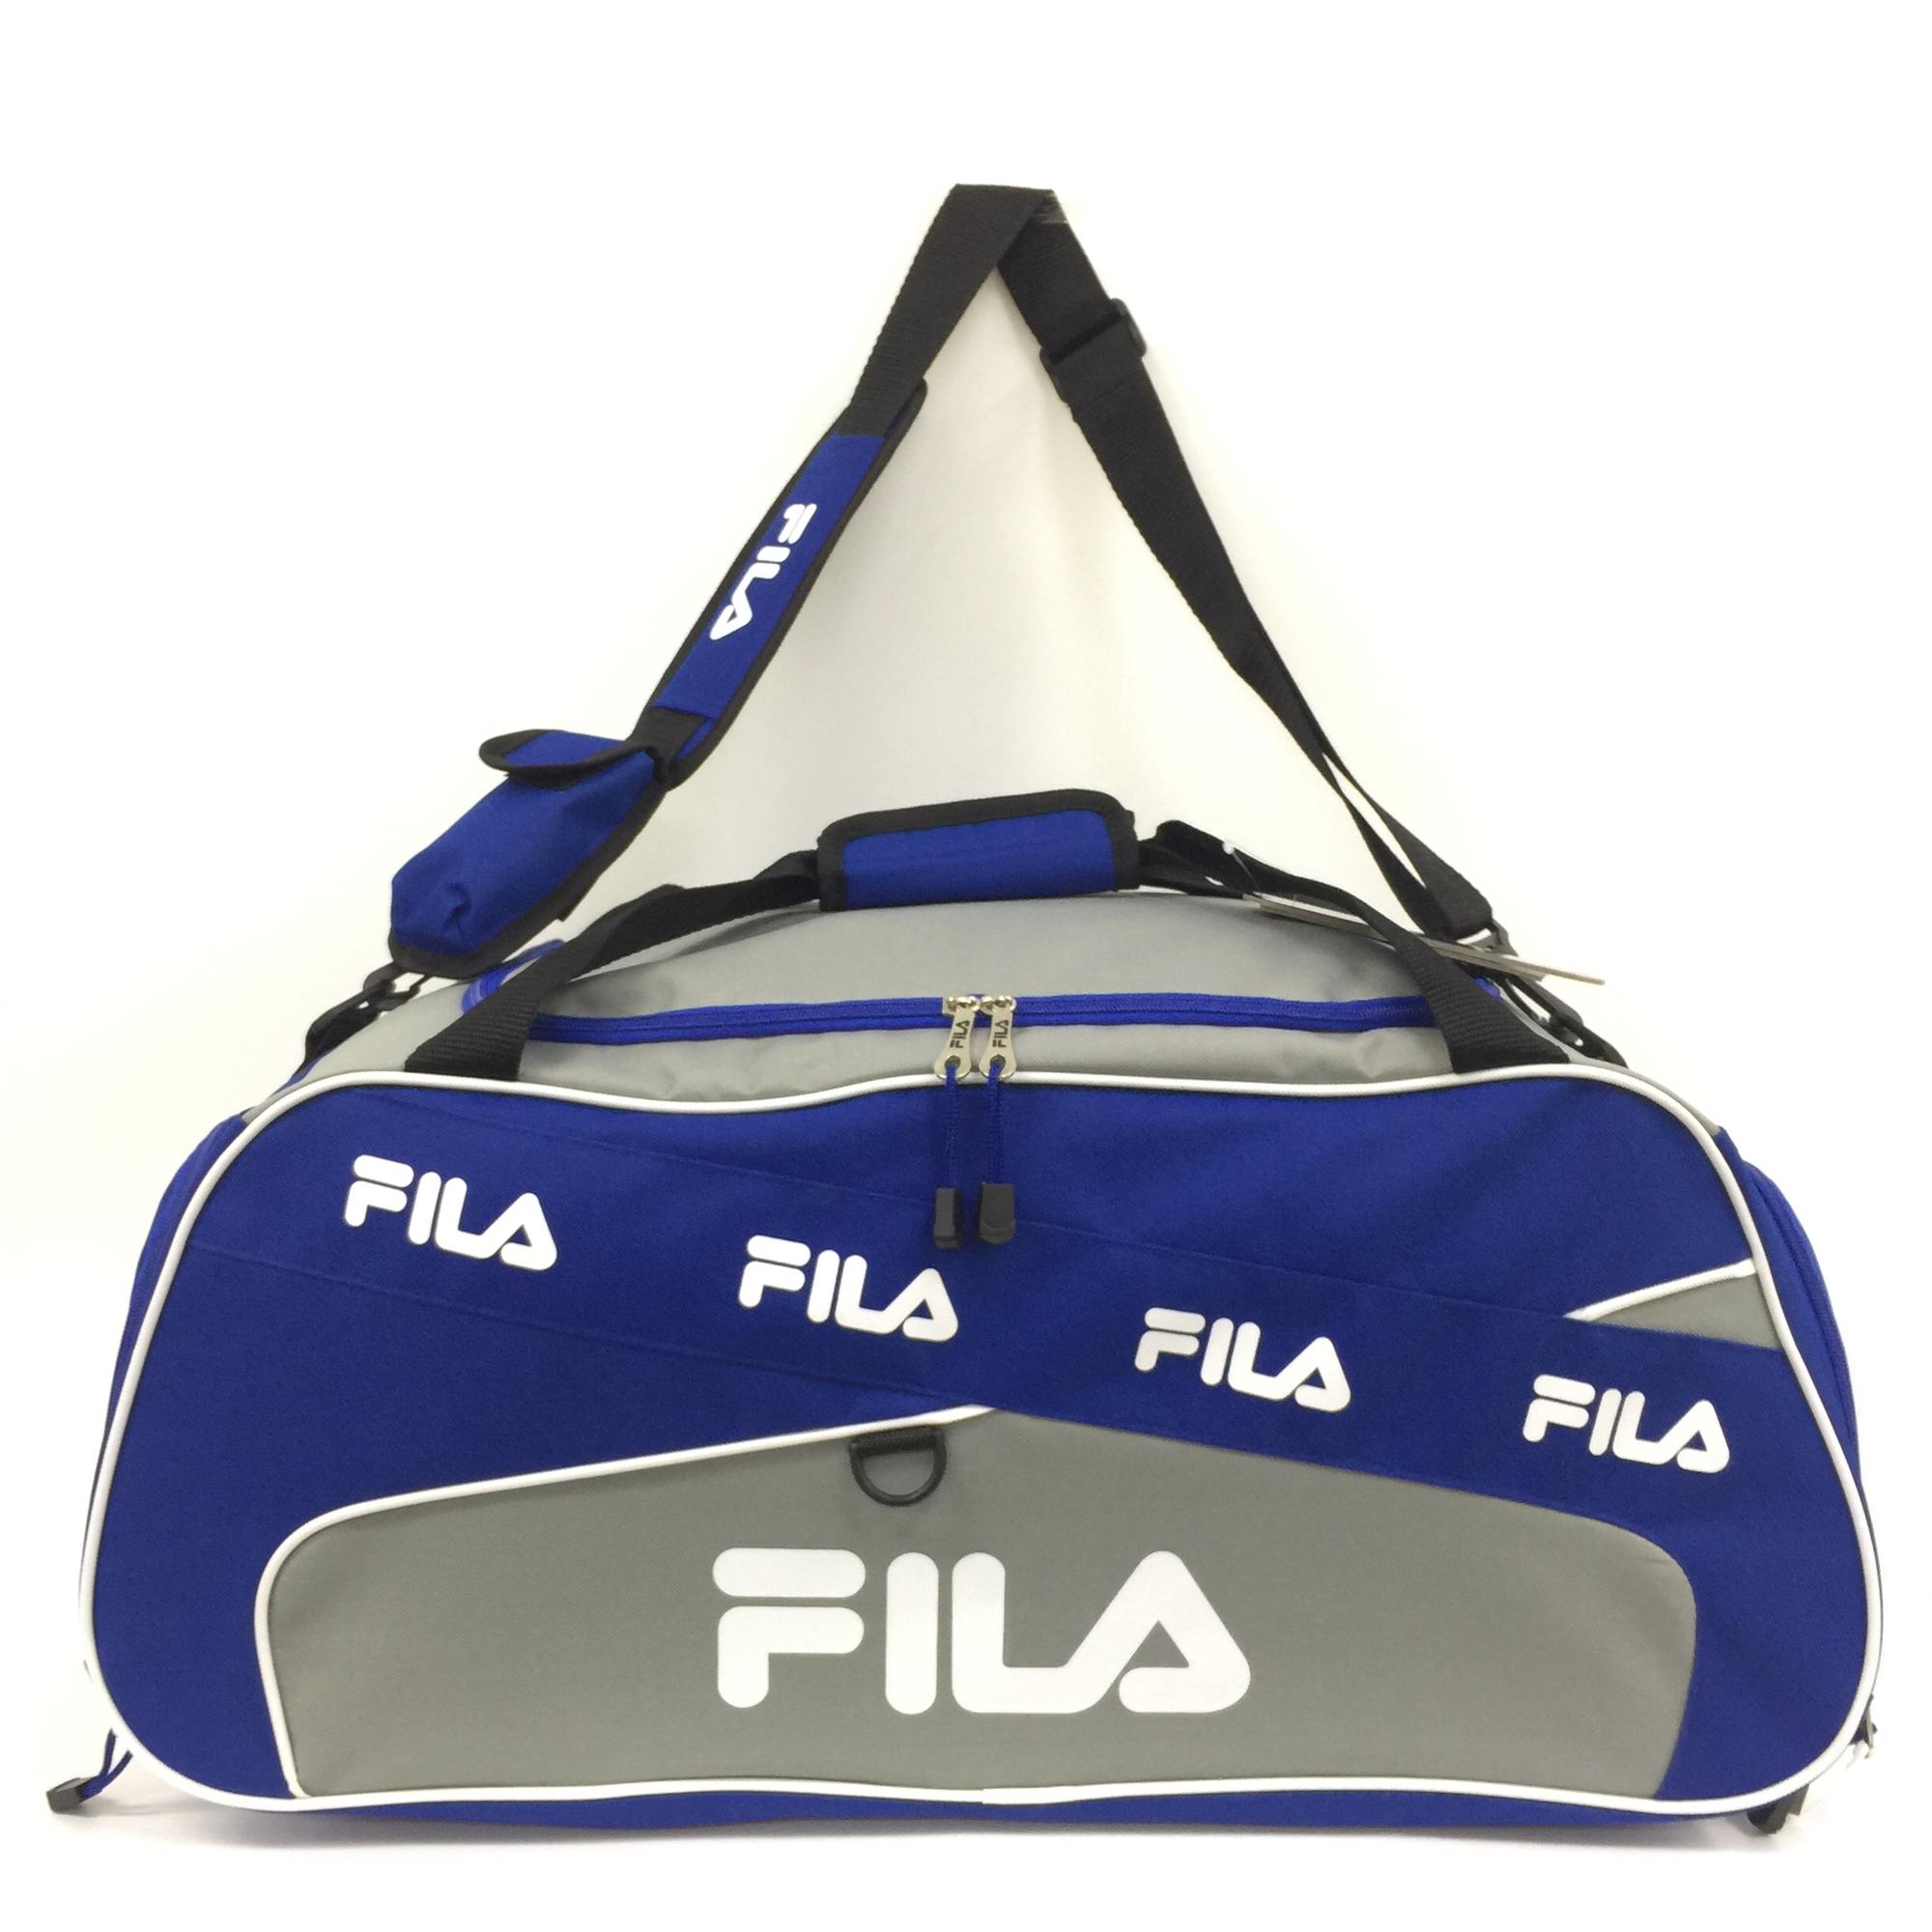 Fila Medium Travel Bag cf3716c318fd3